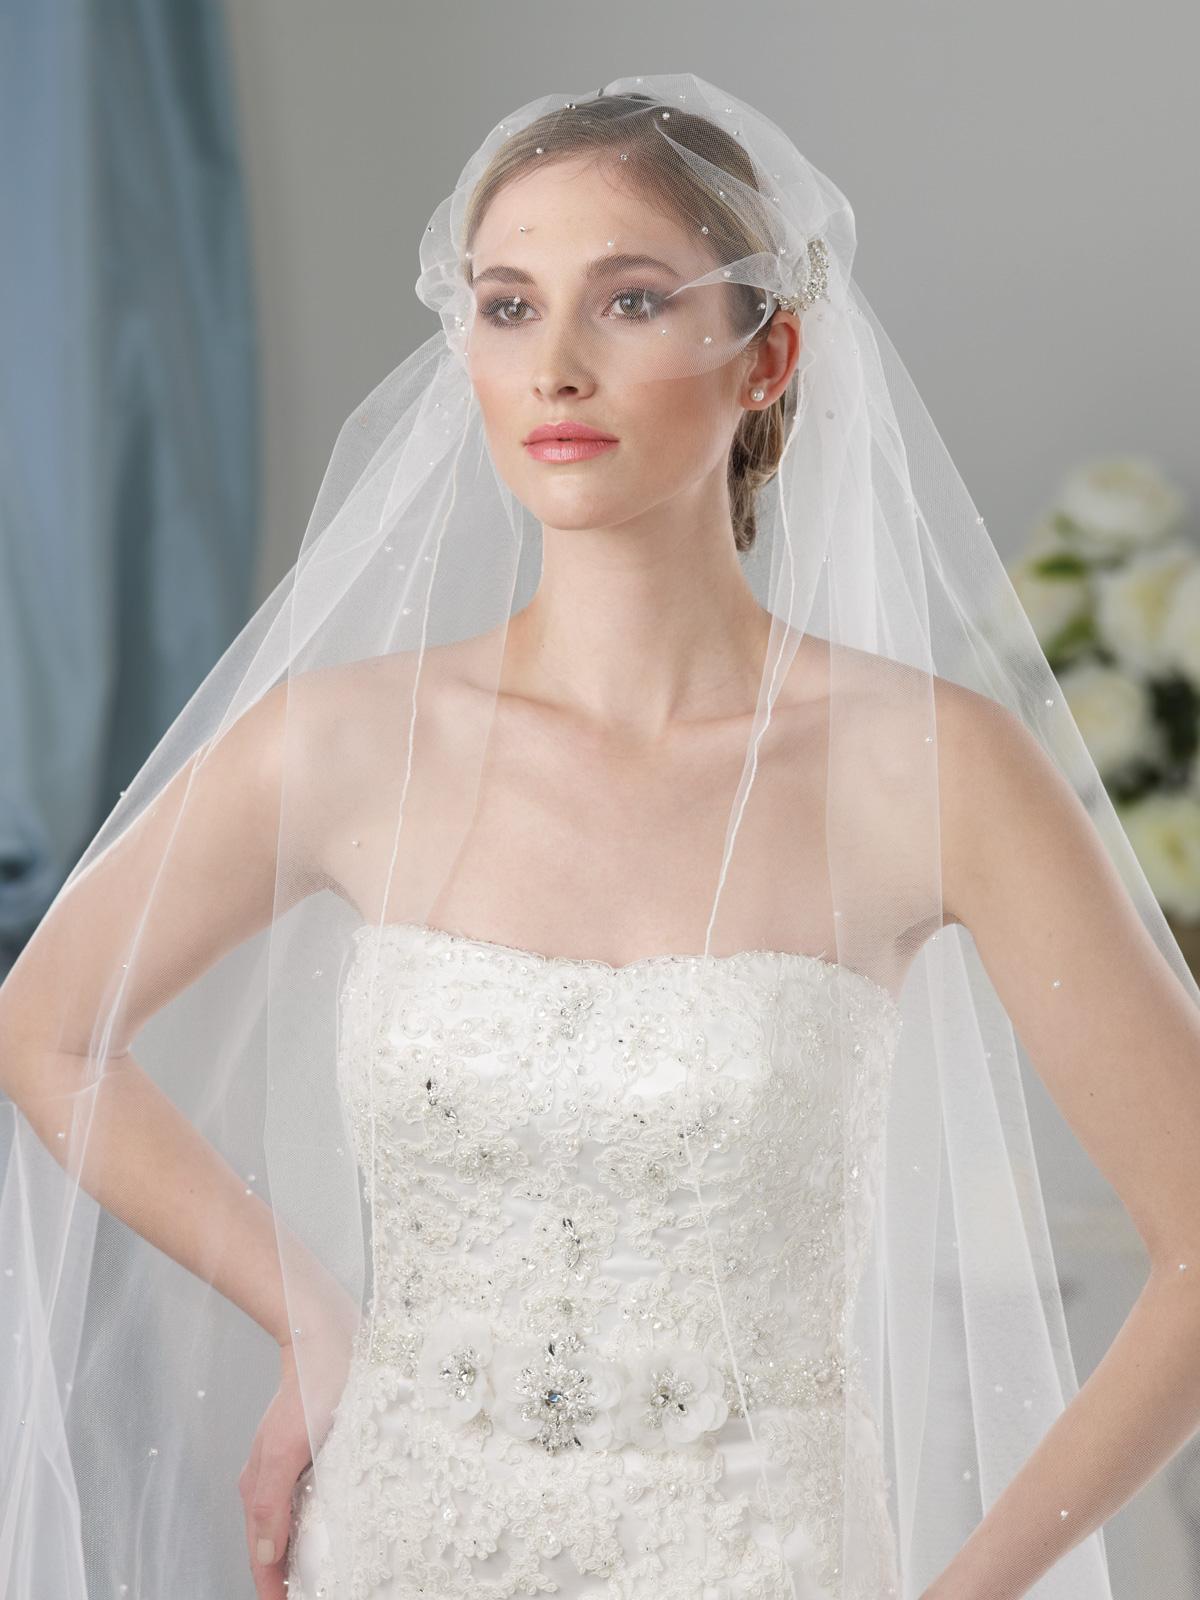 Acessorios Para Noiva - 9644